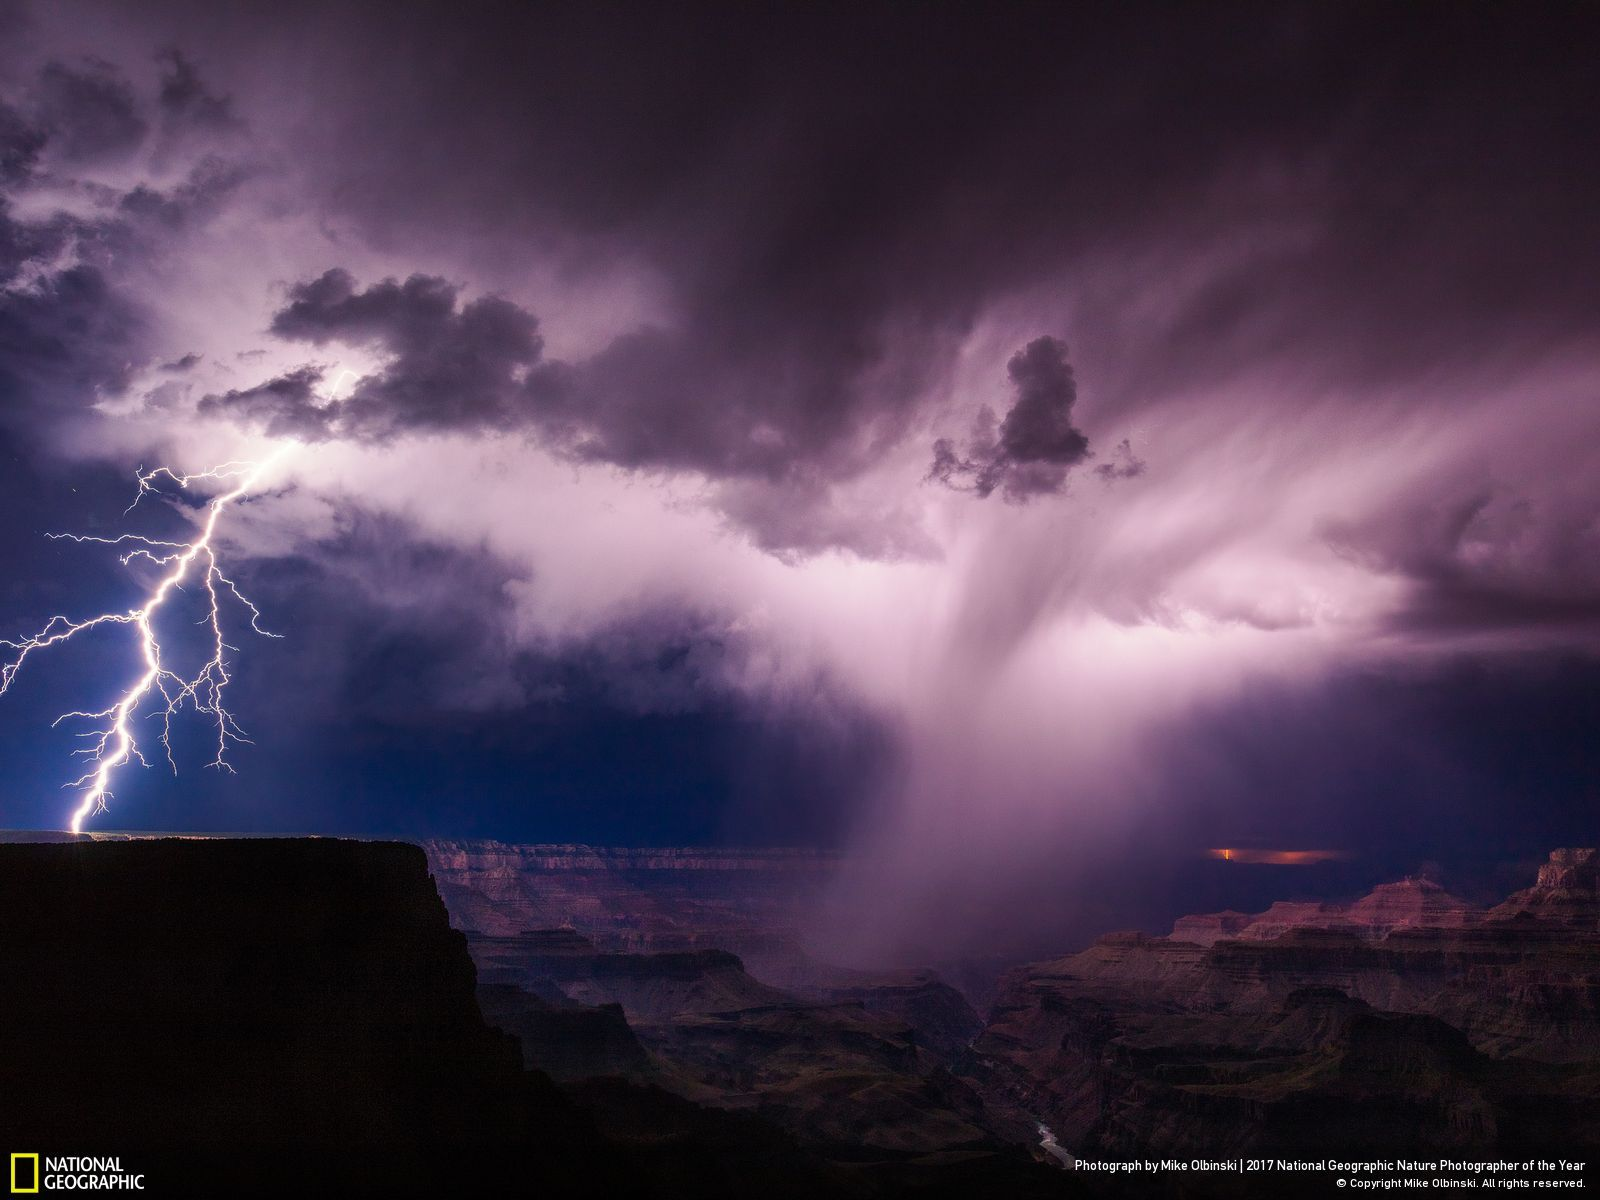 3rd Place, Landscapes. © Mike Olbinski